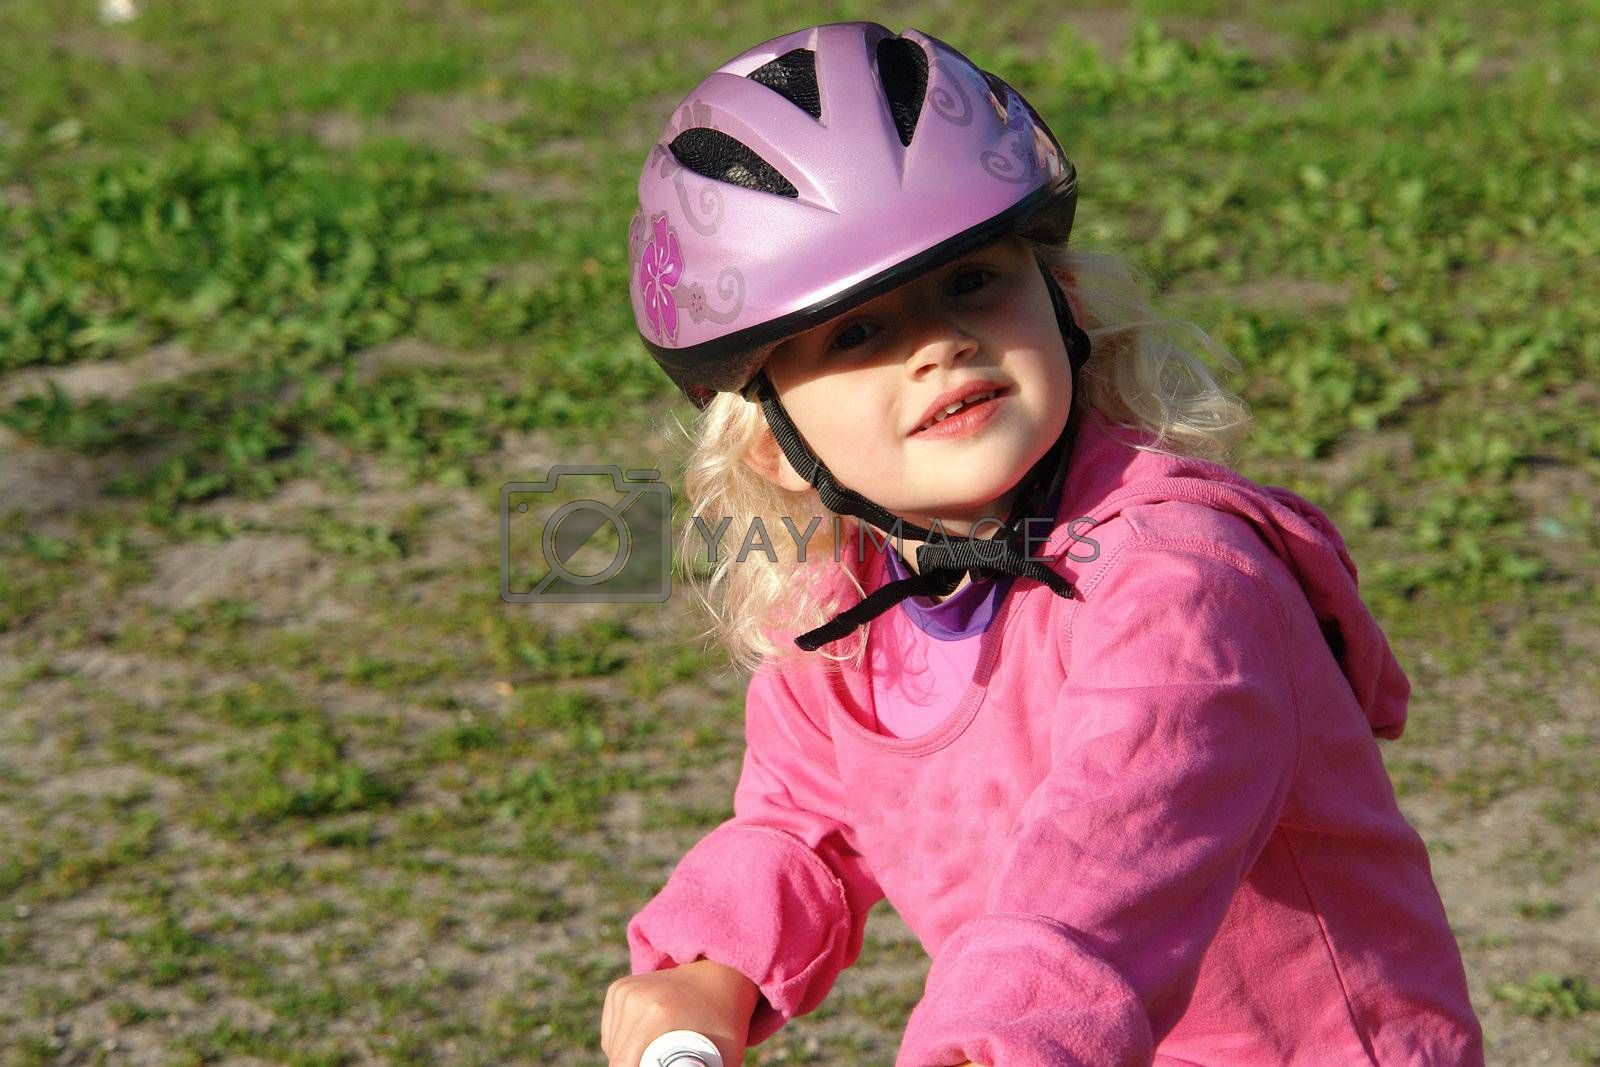 Cute little girl with a helmet riding a bike